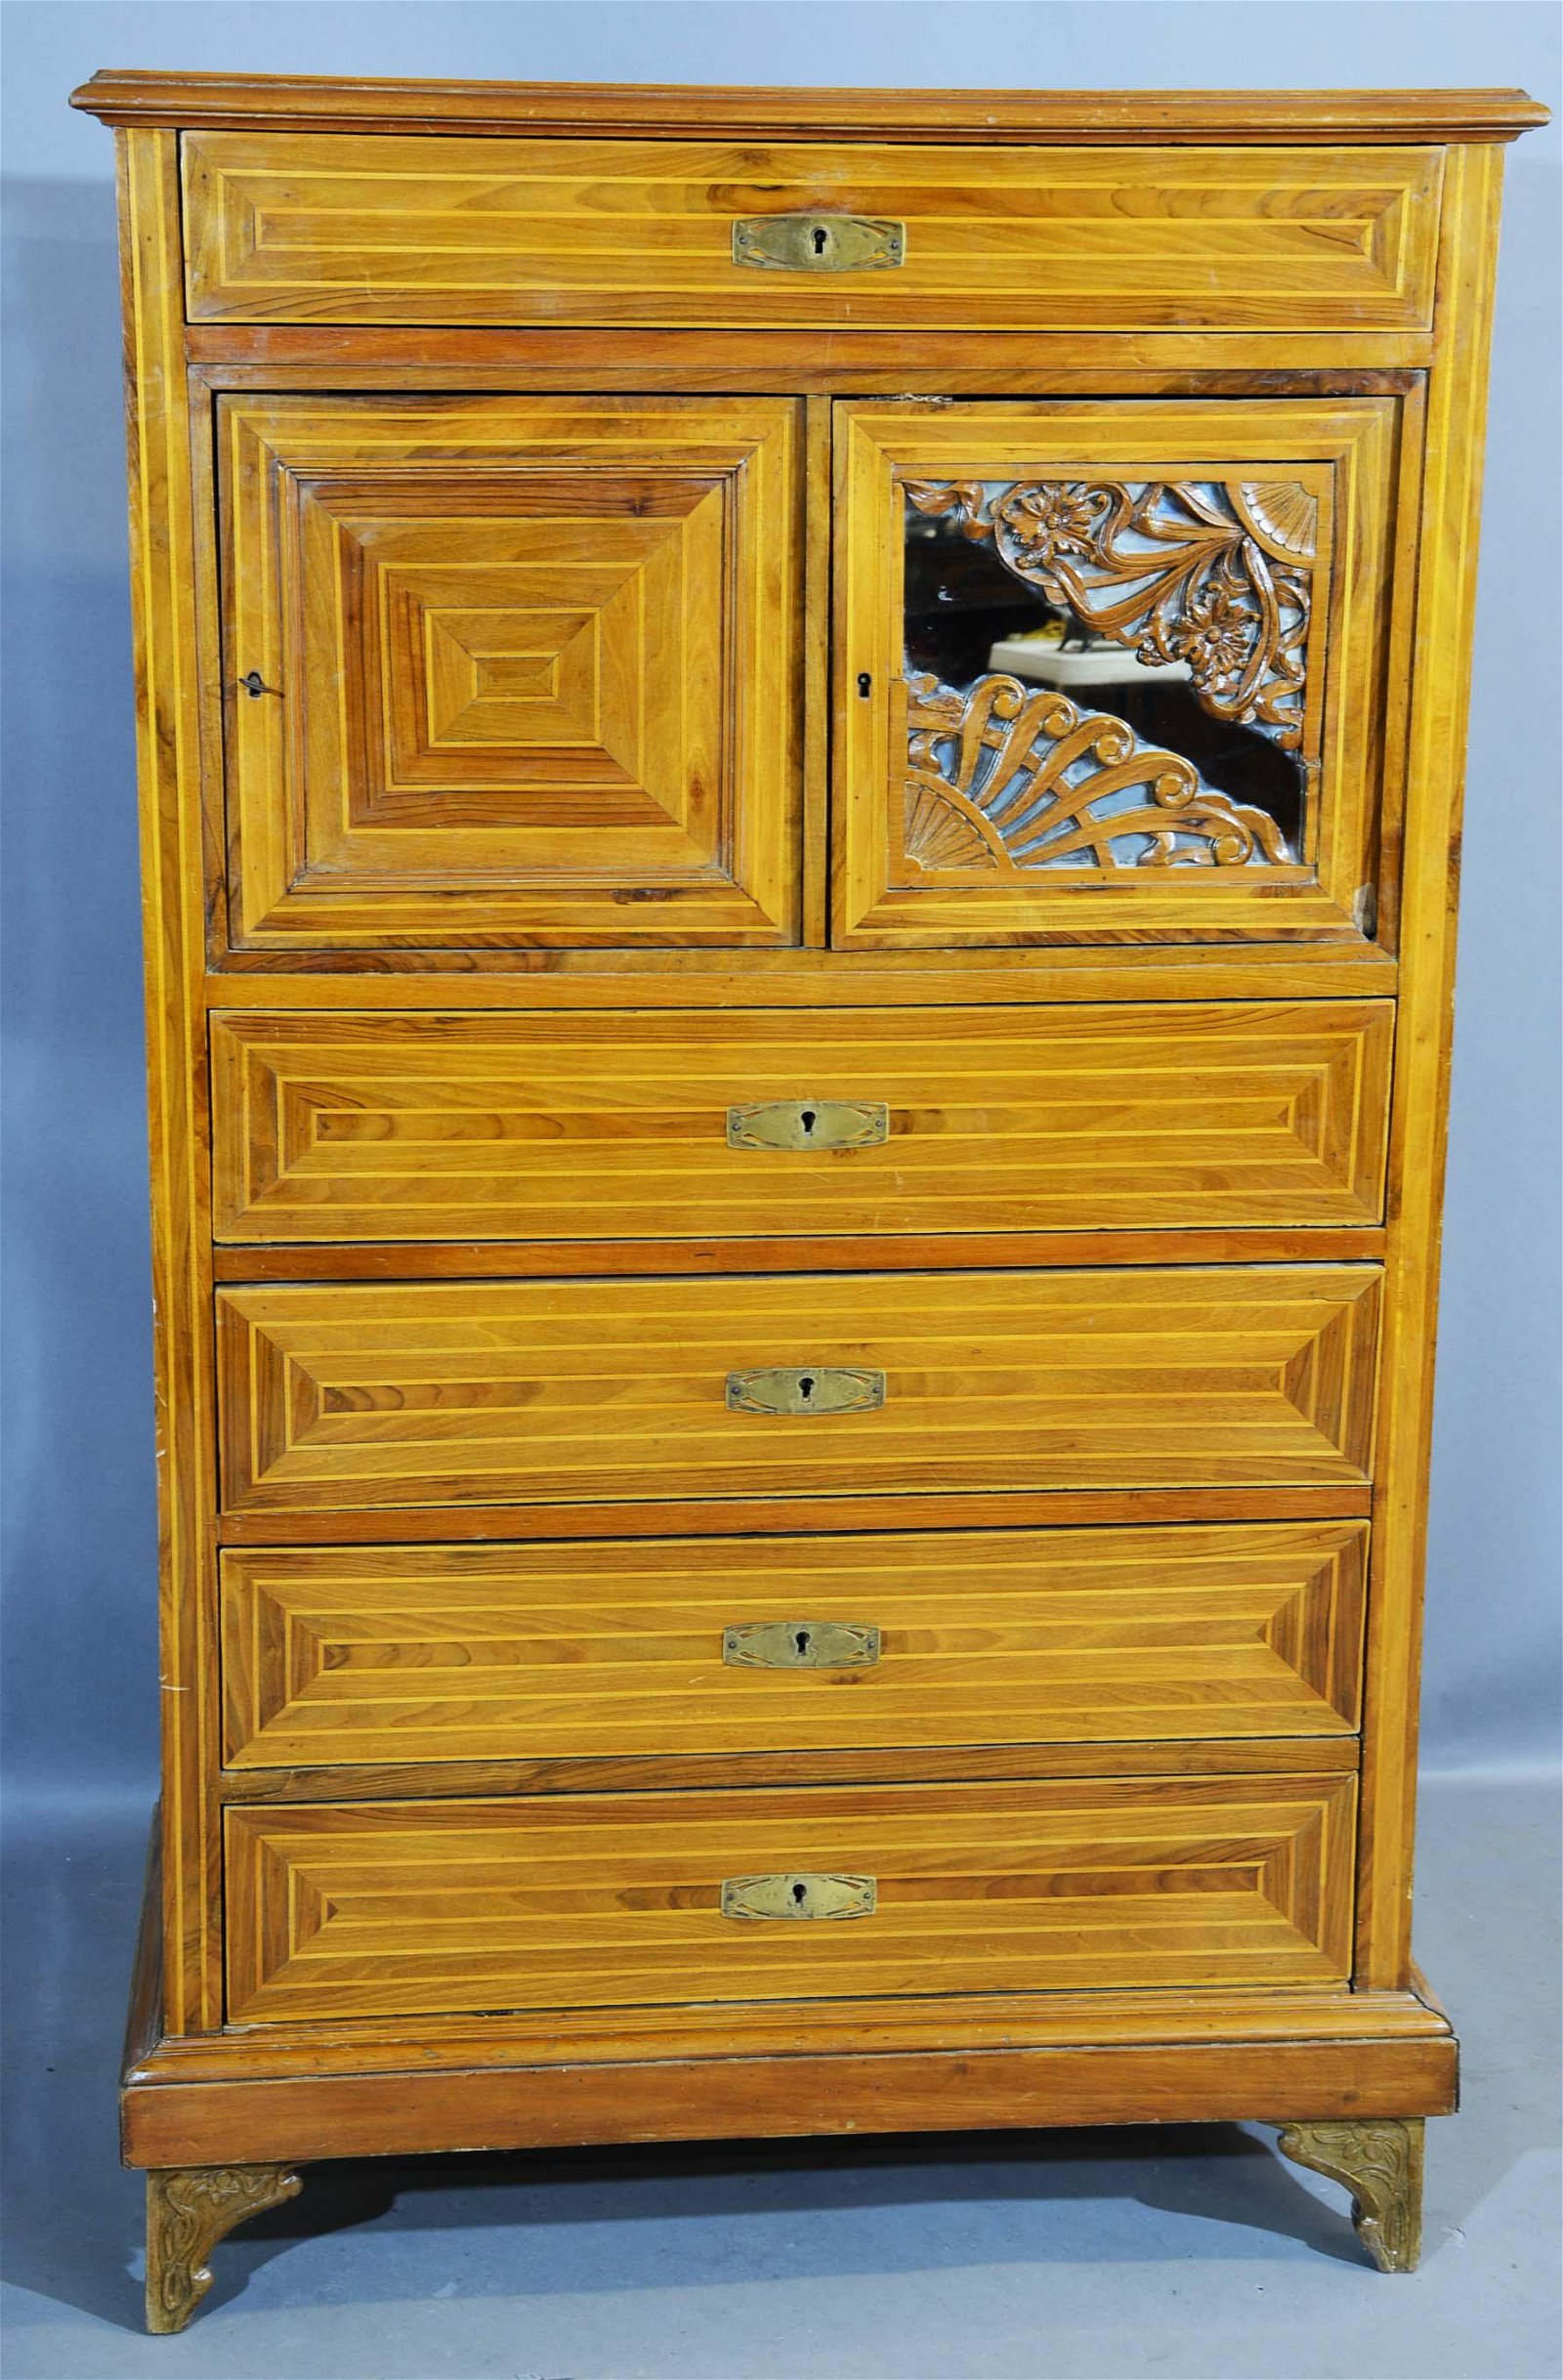 French Art Nouveau Walnut Tall Chest